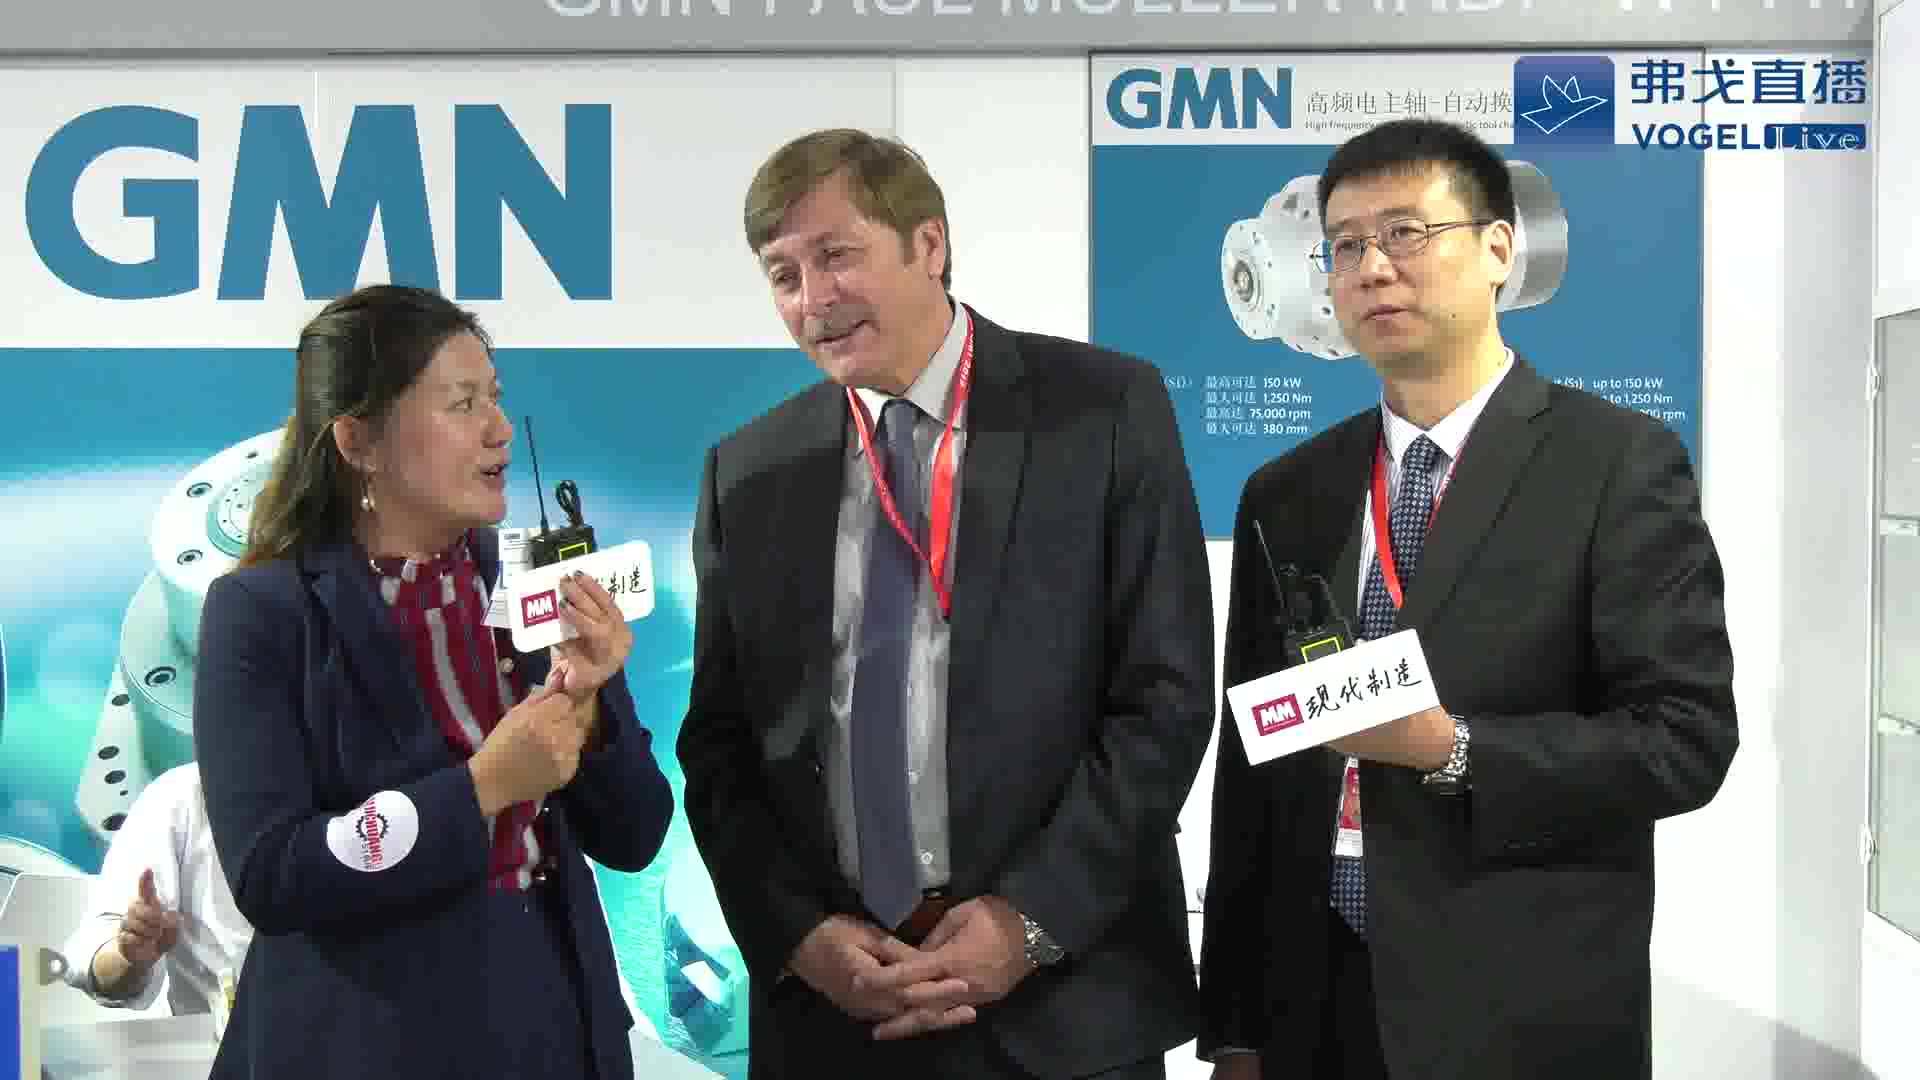 Dieter Weiss先生 德国GMN公司副总裁、GMN中国销售经理王晓东先生-CIMT2019